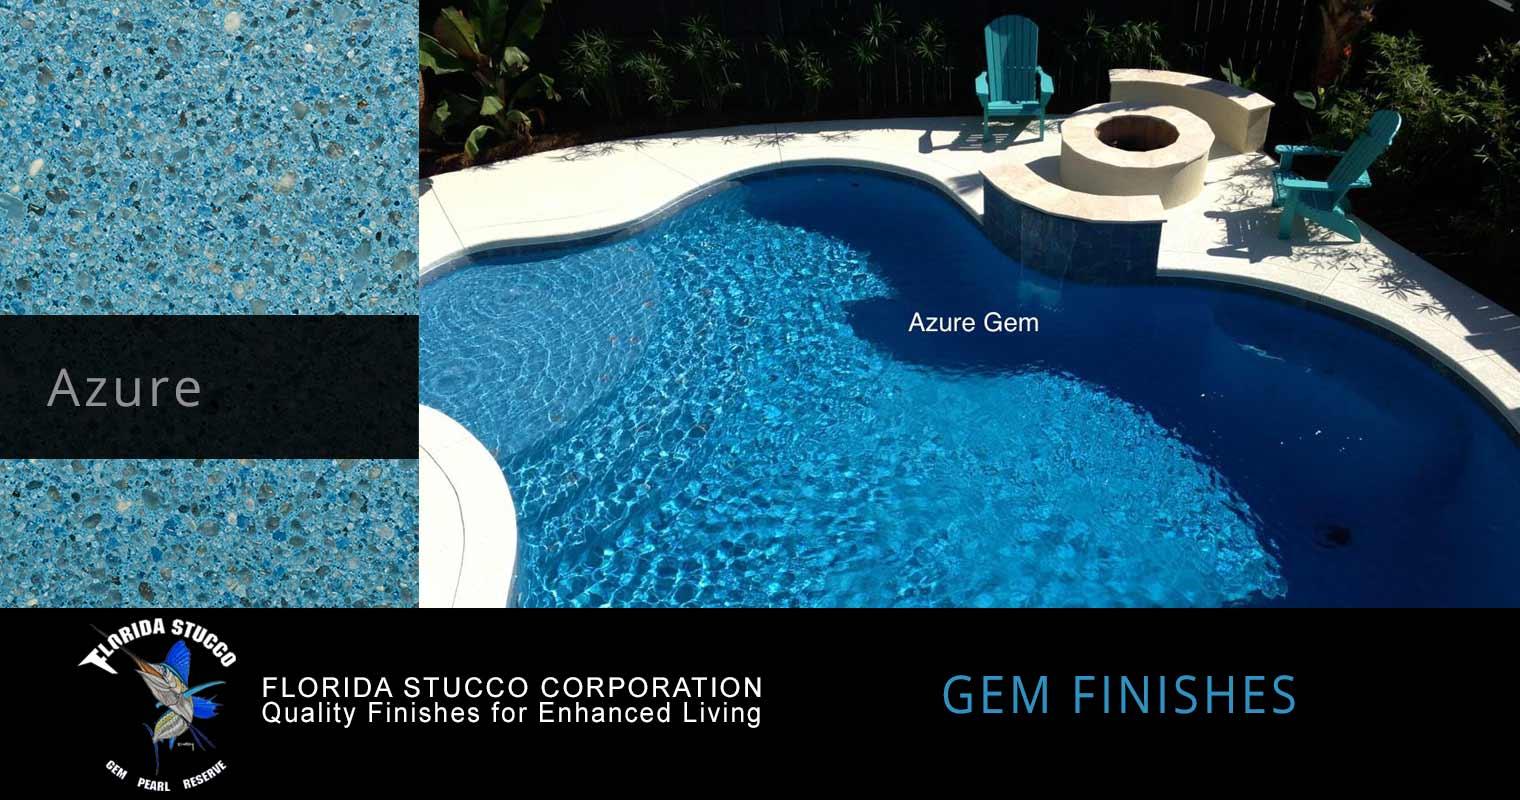 Florida Stucco - Azure Plaster Finish Pool Sample 1